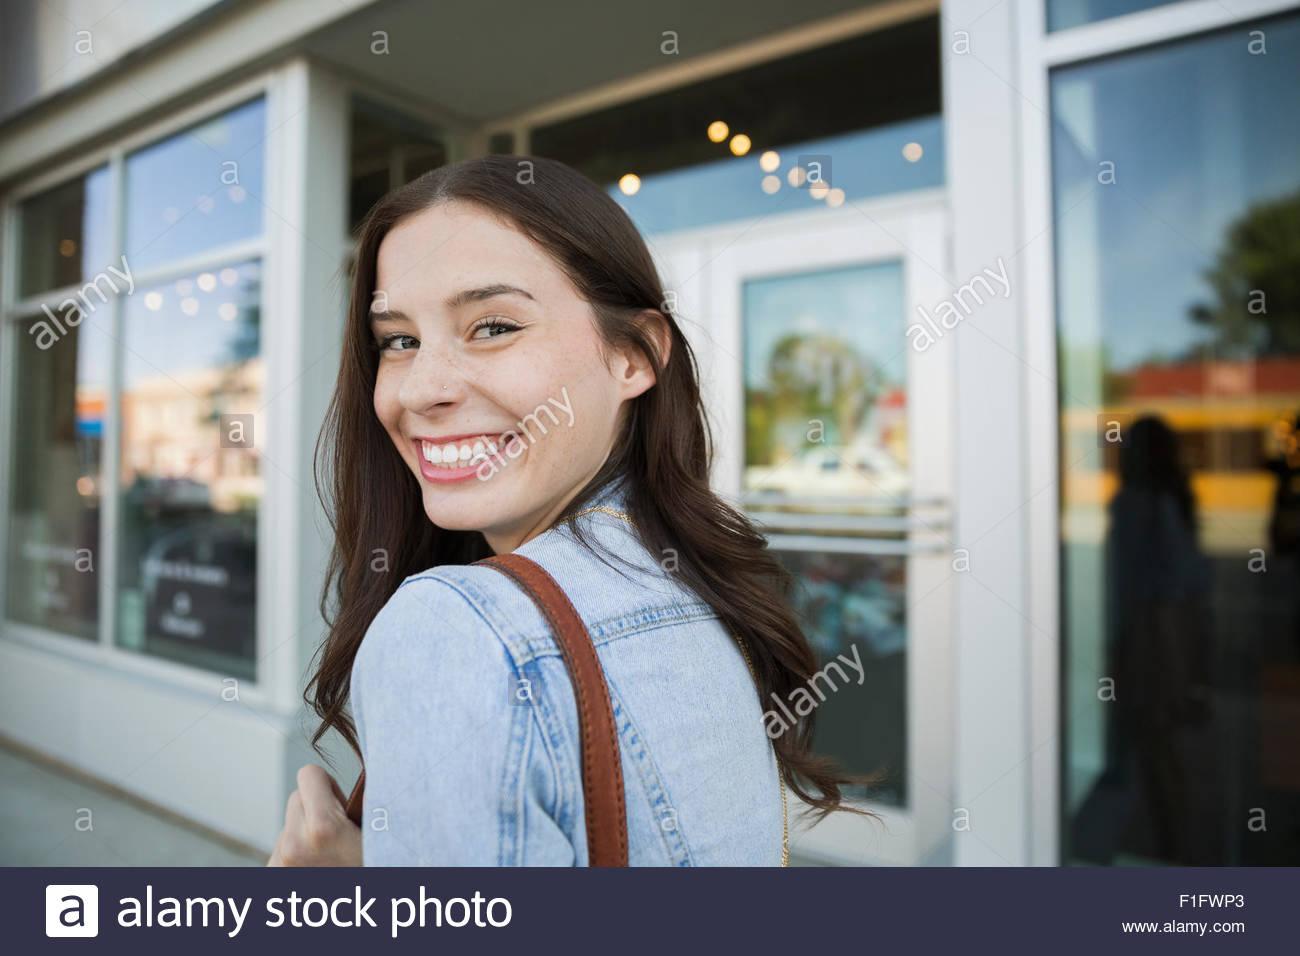 Portrait smiling brunette woman looking over shoulder - Stock Image